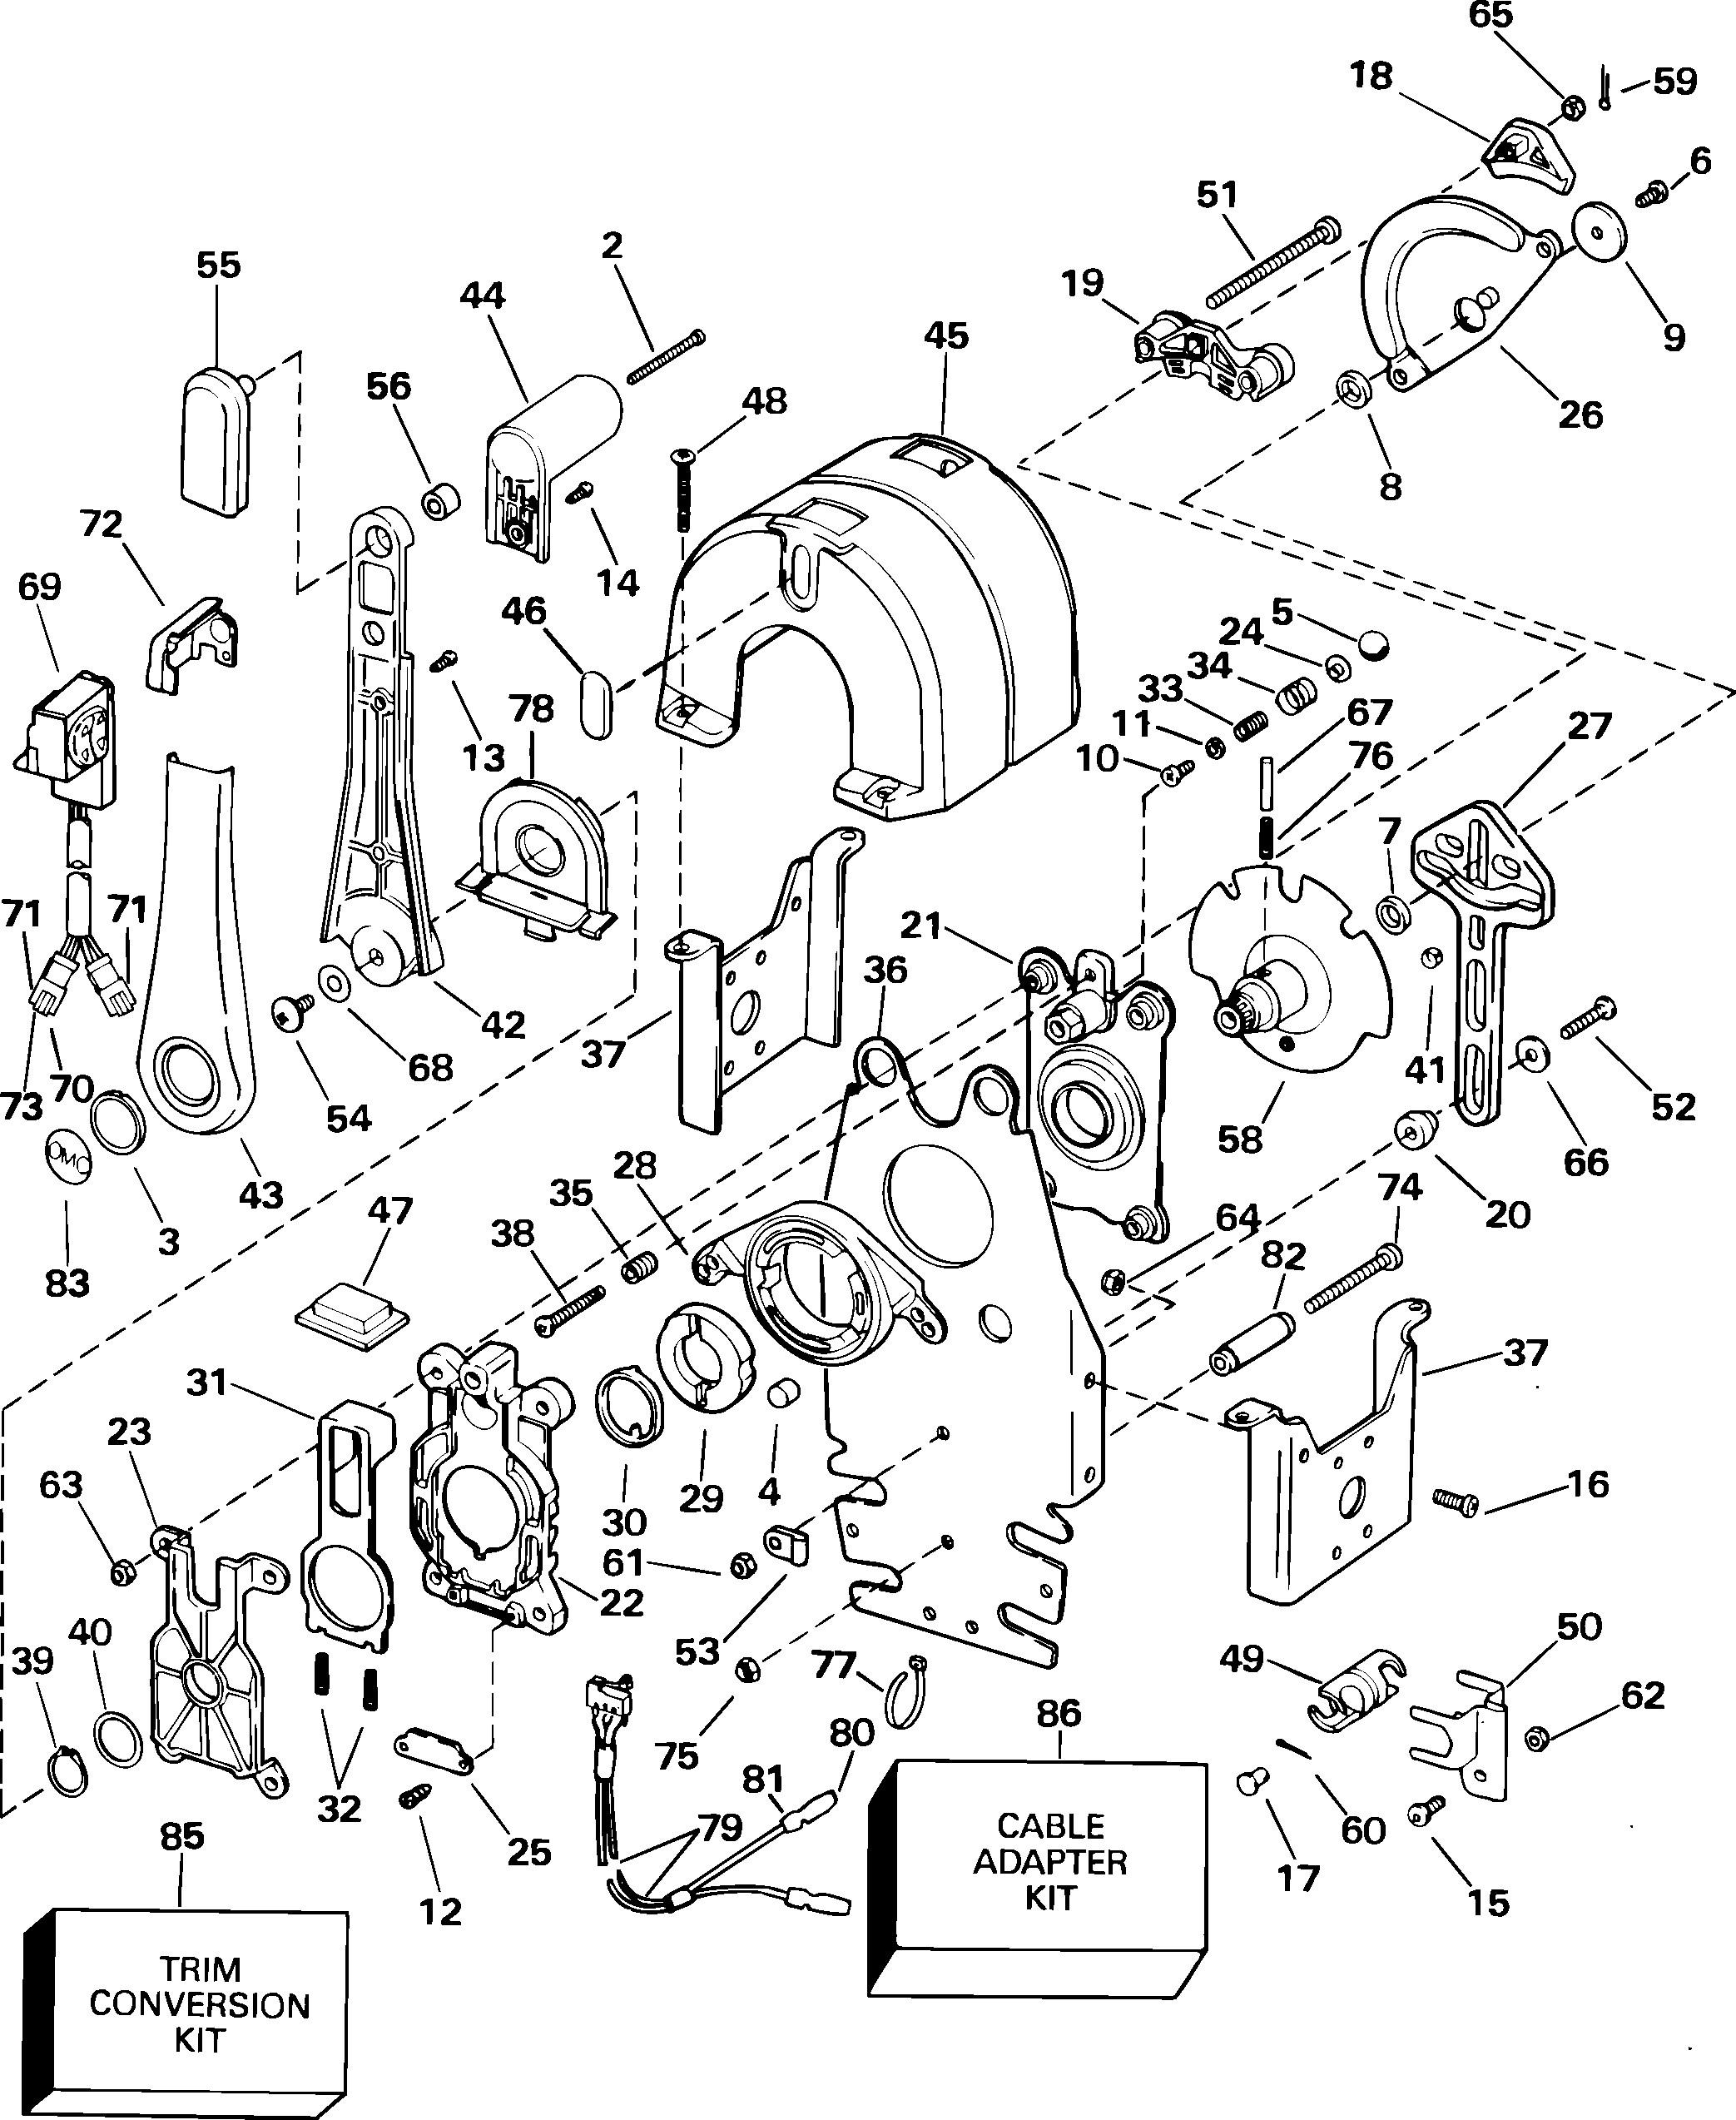 Qd Control Box Wiring Diagram] Yamaha Control Box Diagram Full Version Hd Quality Of Qd Control Box Wiring